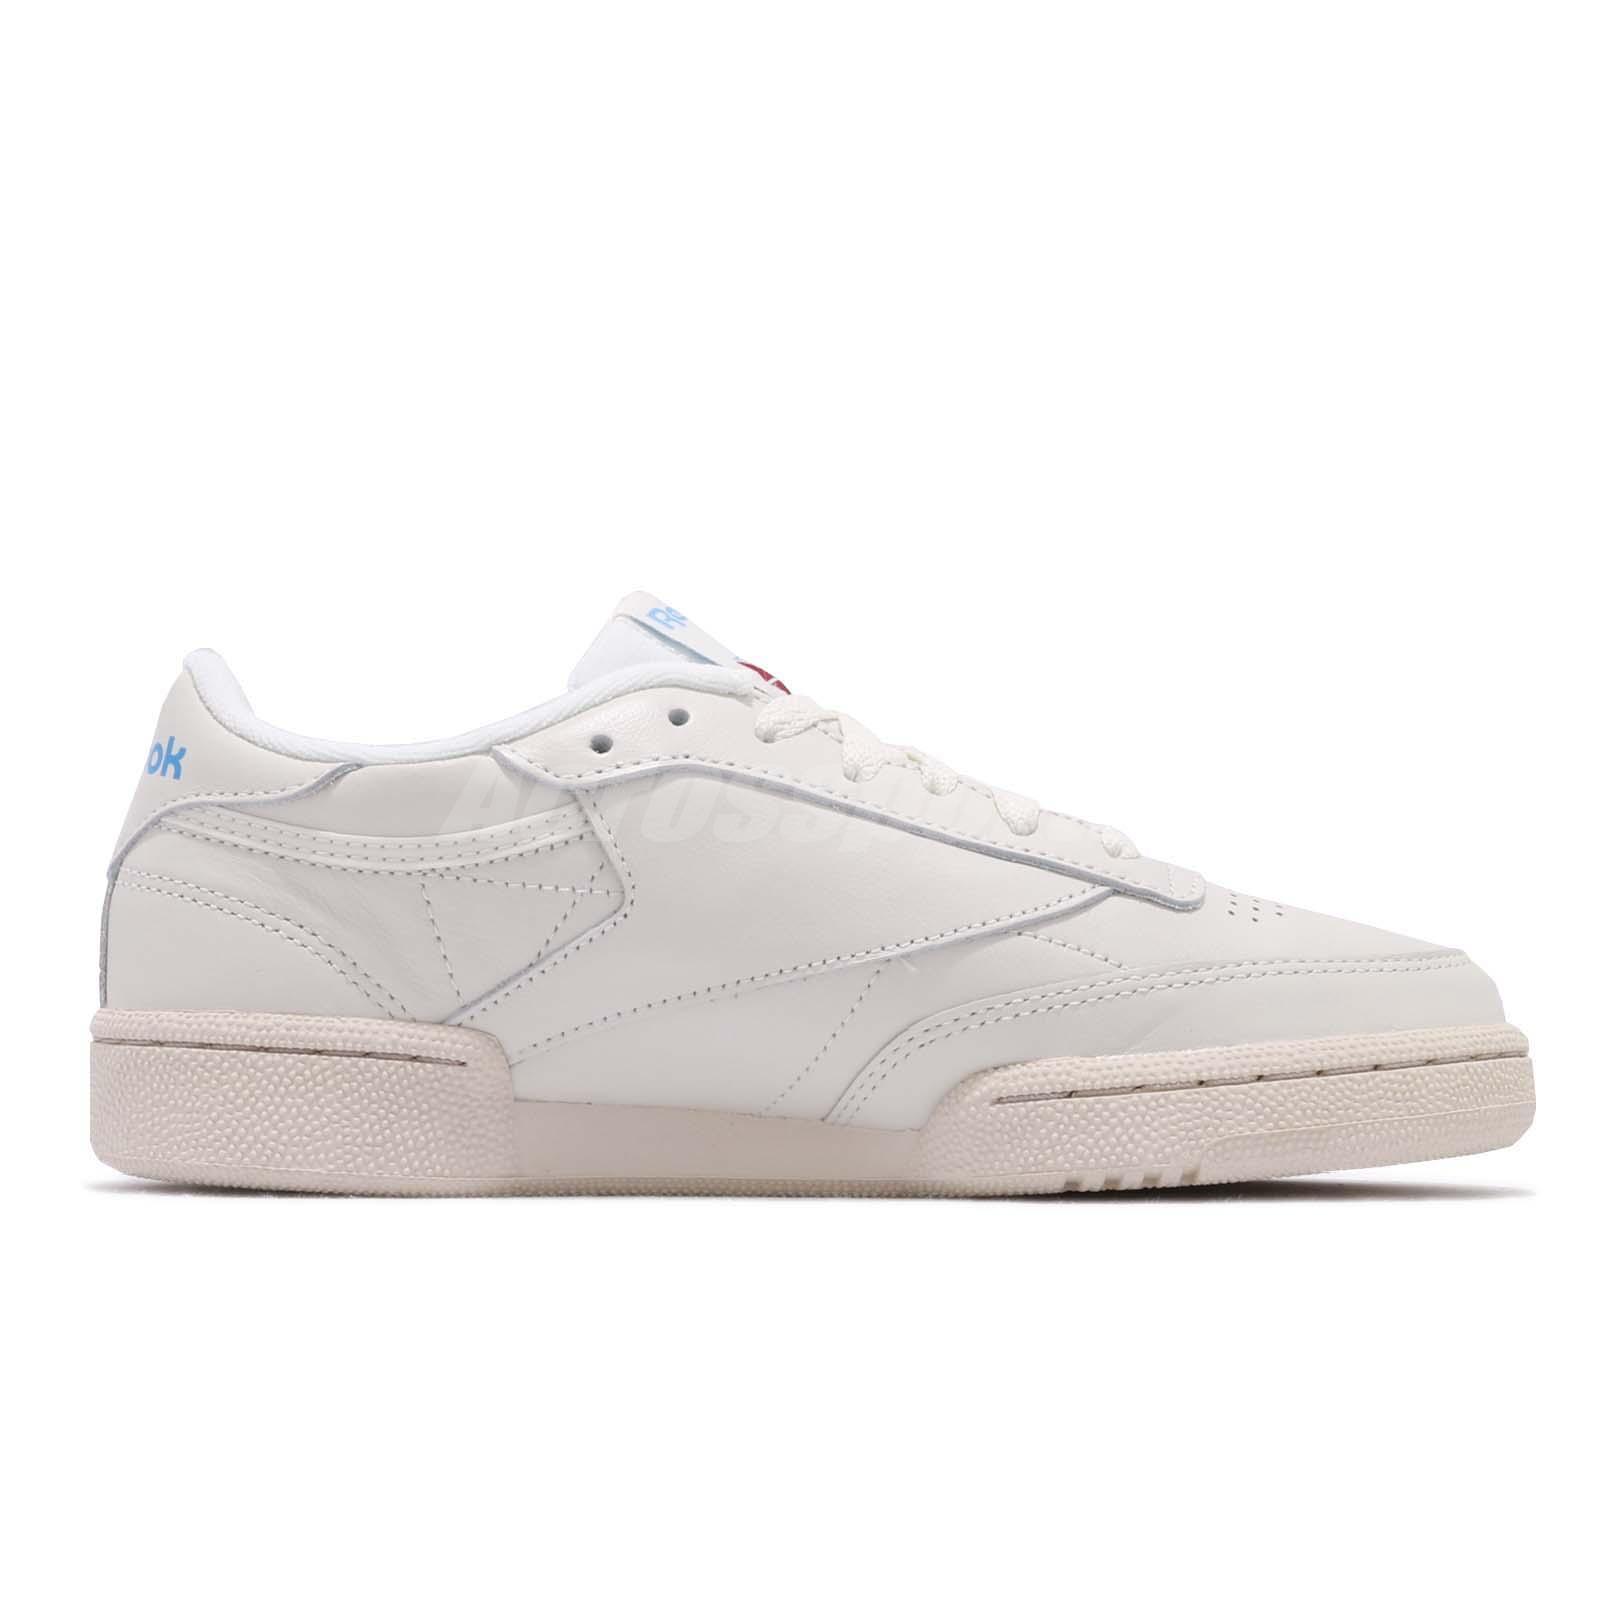 ab116835ee1 Reebok Club C 85 Vintage Beige Chalk Blue Womens Casual Shoes ...